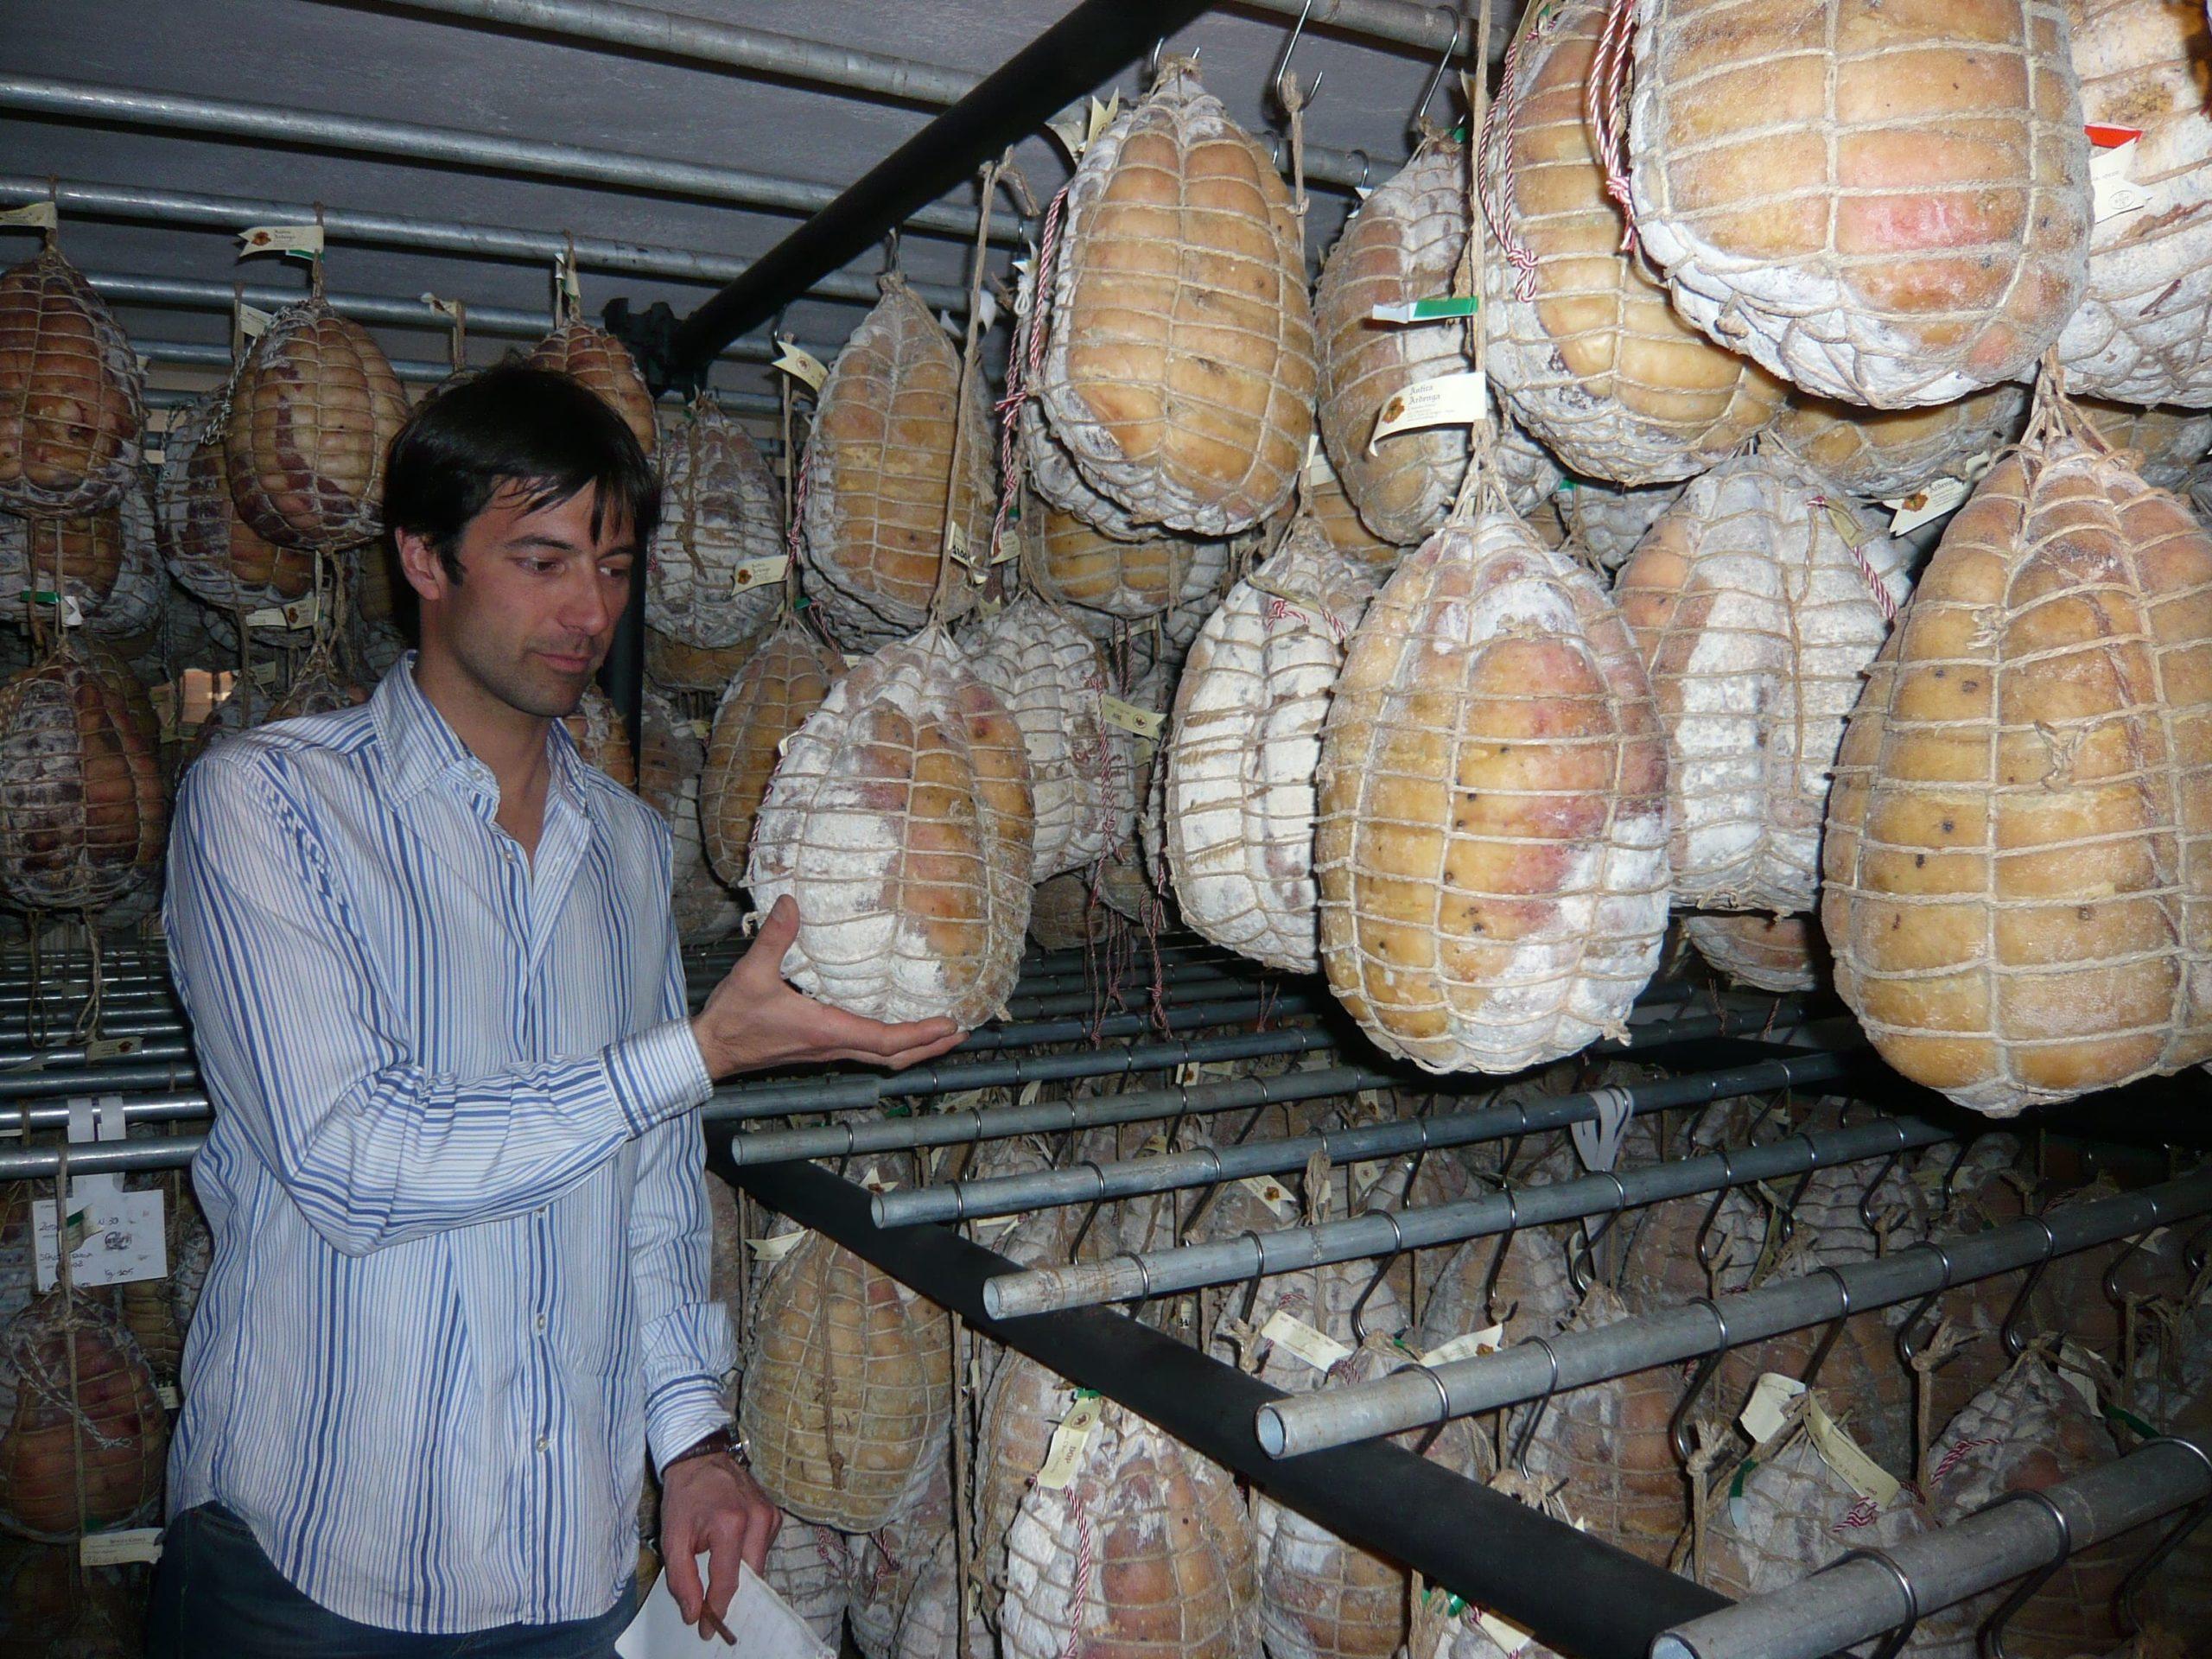 Riccardo in a Culatello refining cellar